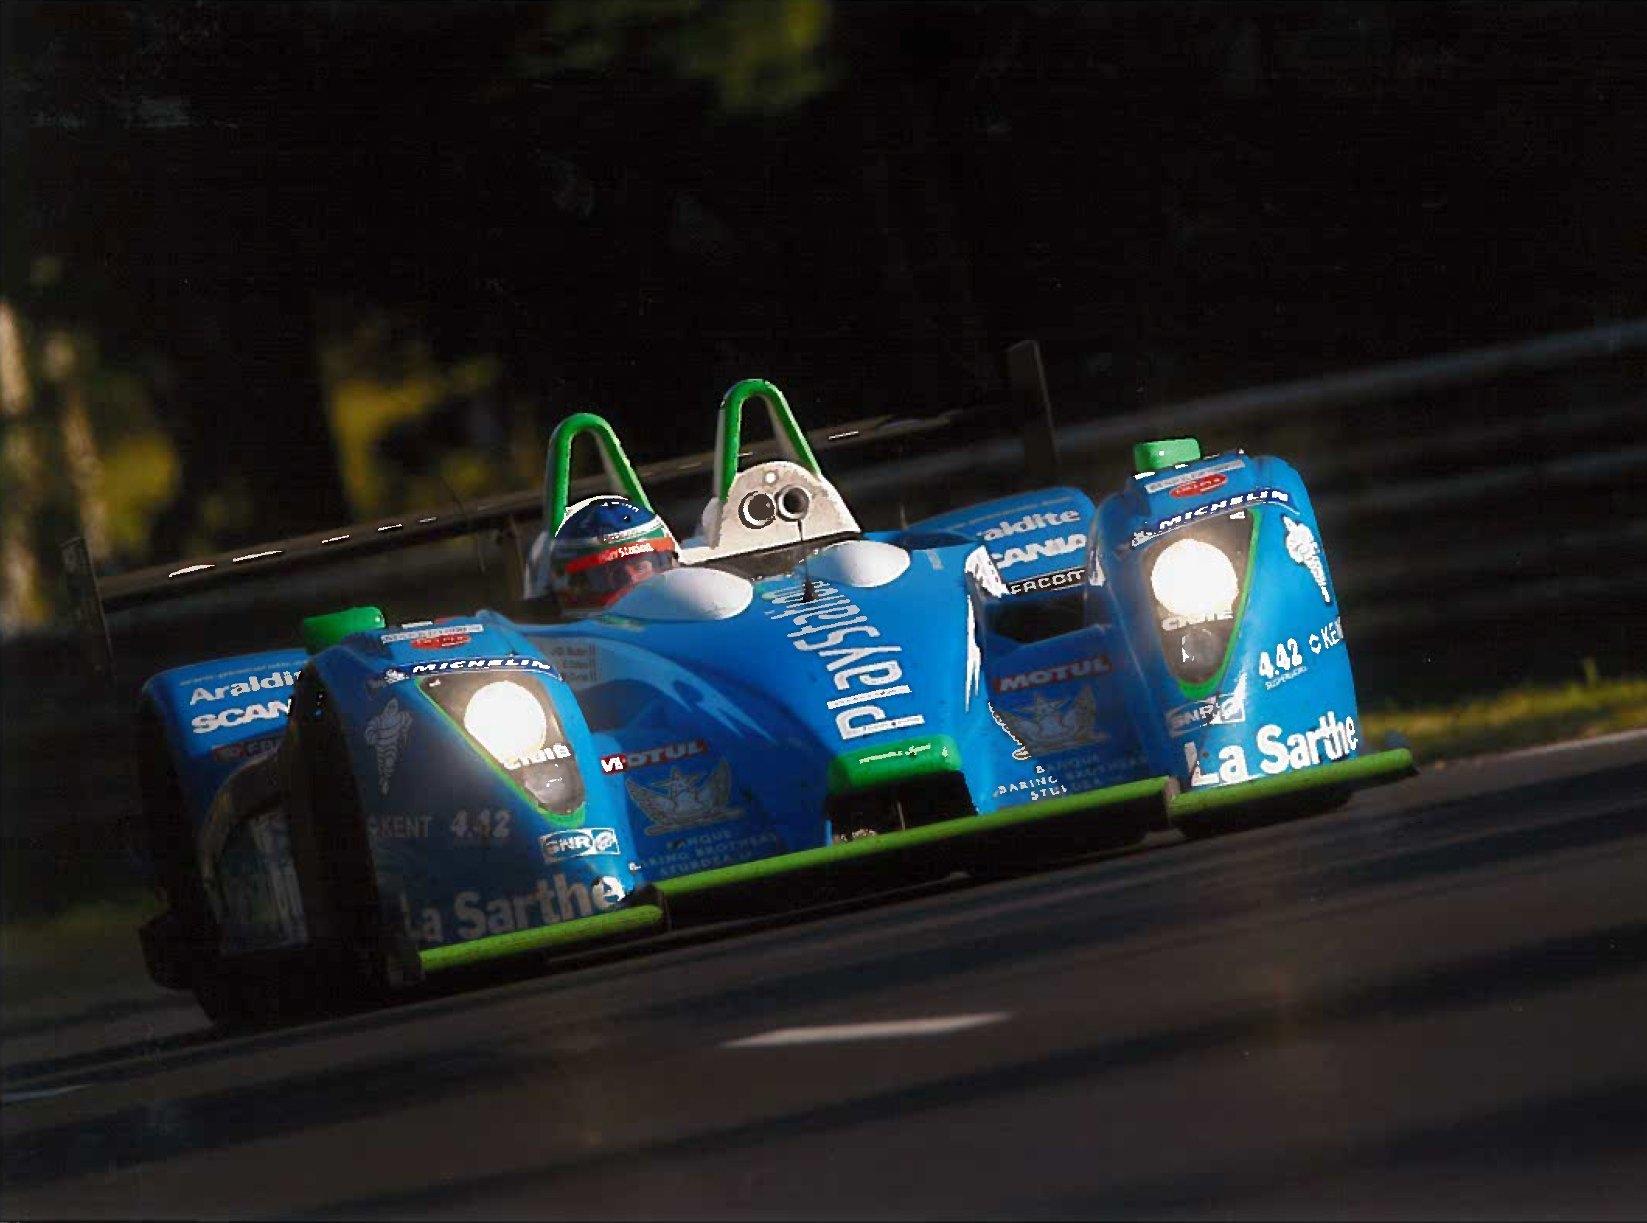 Pescarolo LMP1 24 h du Mans 07 4.jpg